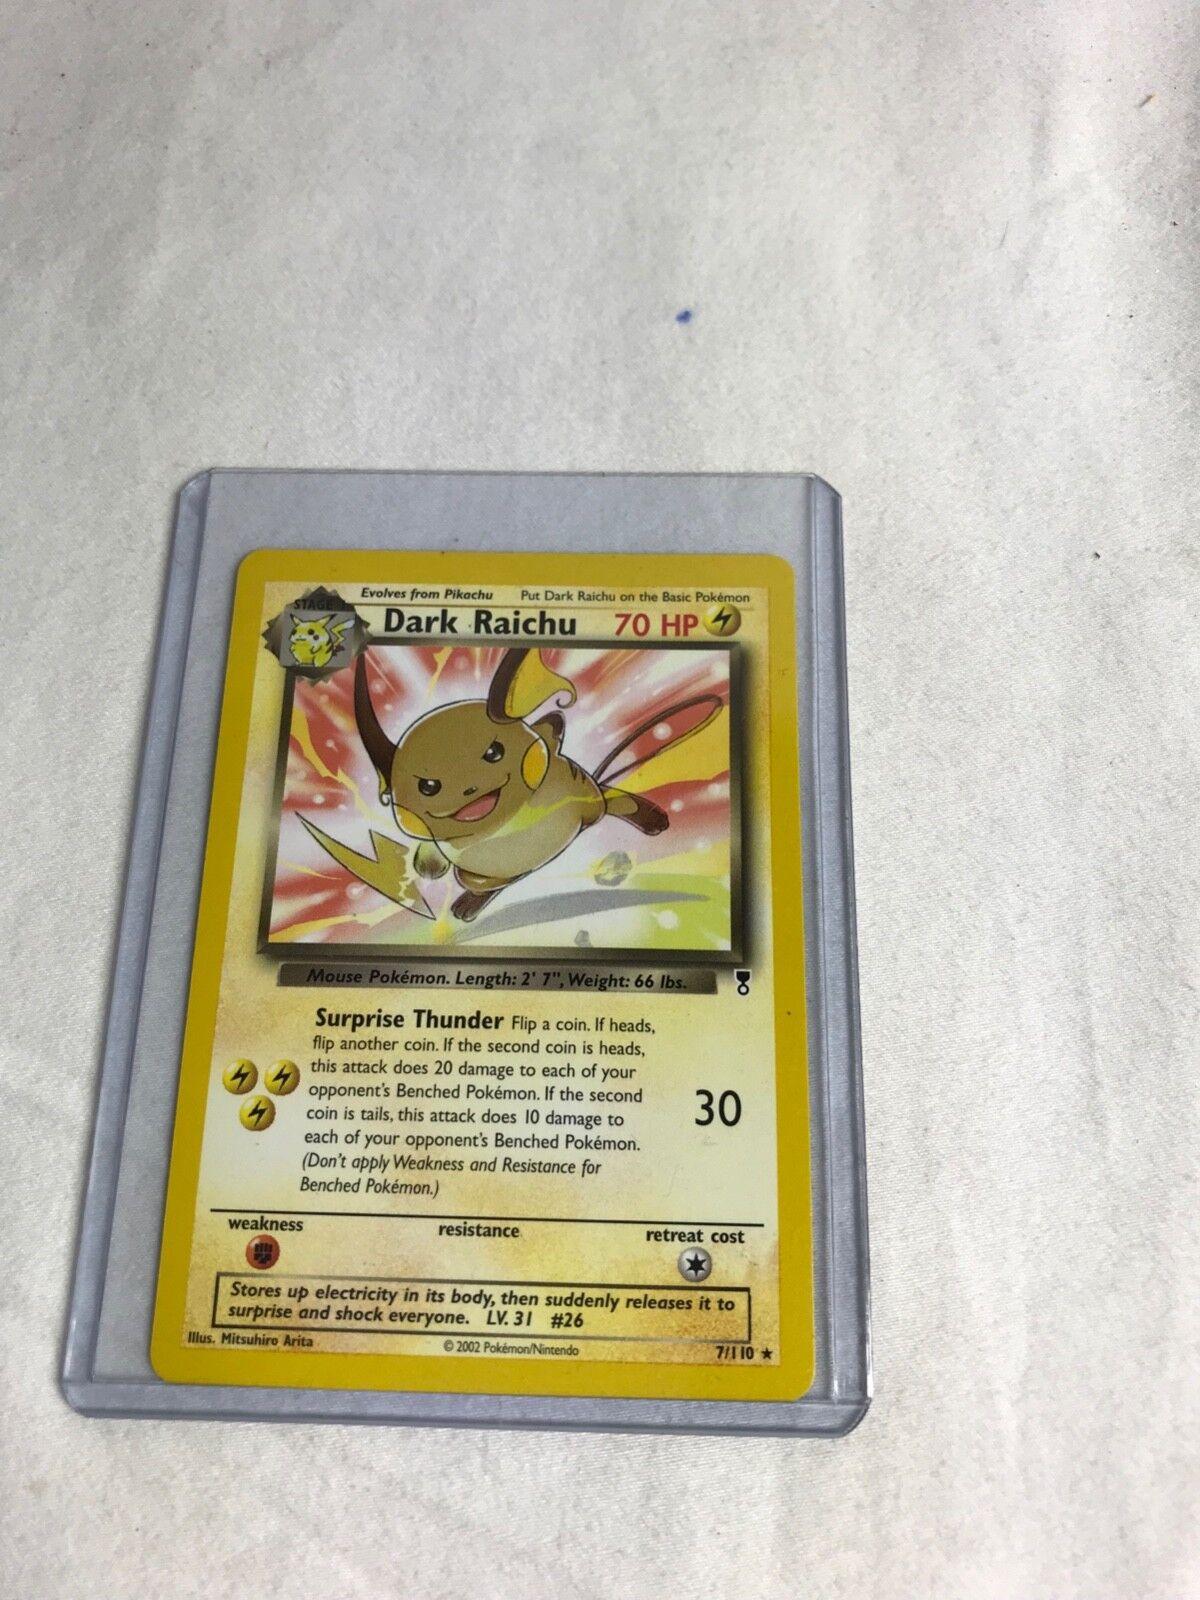 Pokémon Dark Raichu -7 110 Pokémon Card